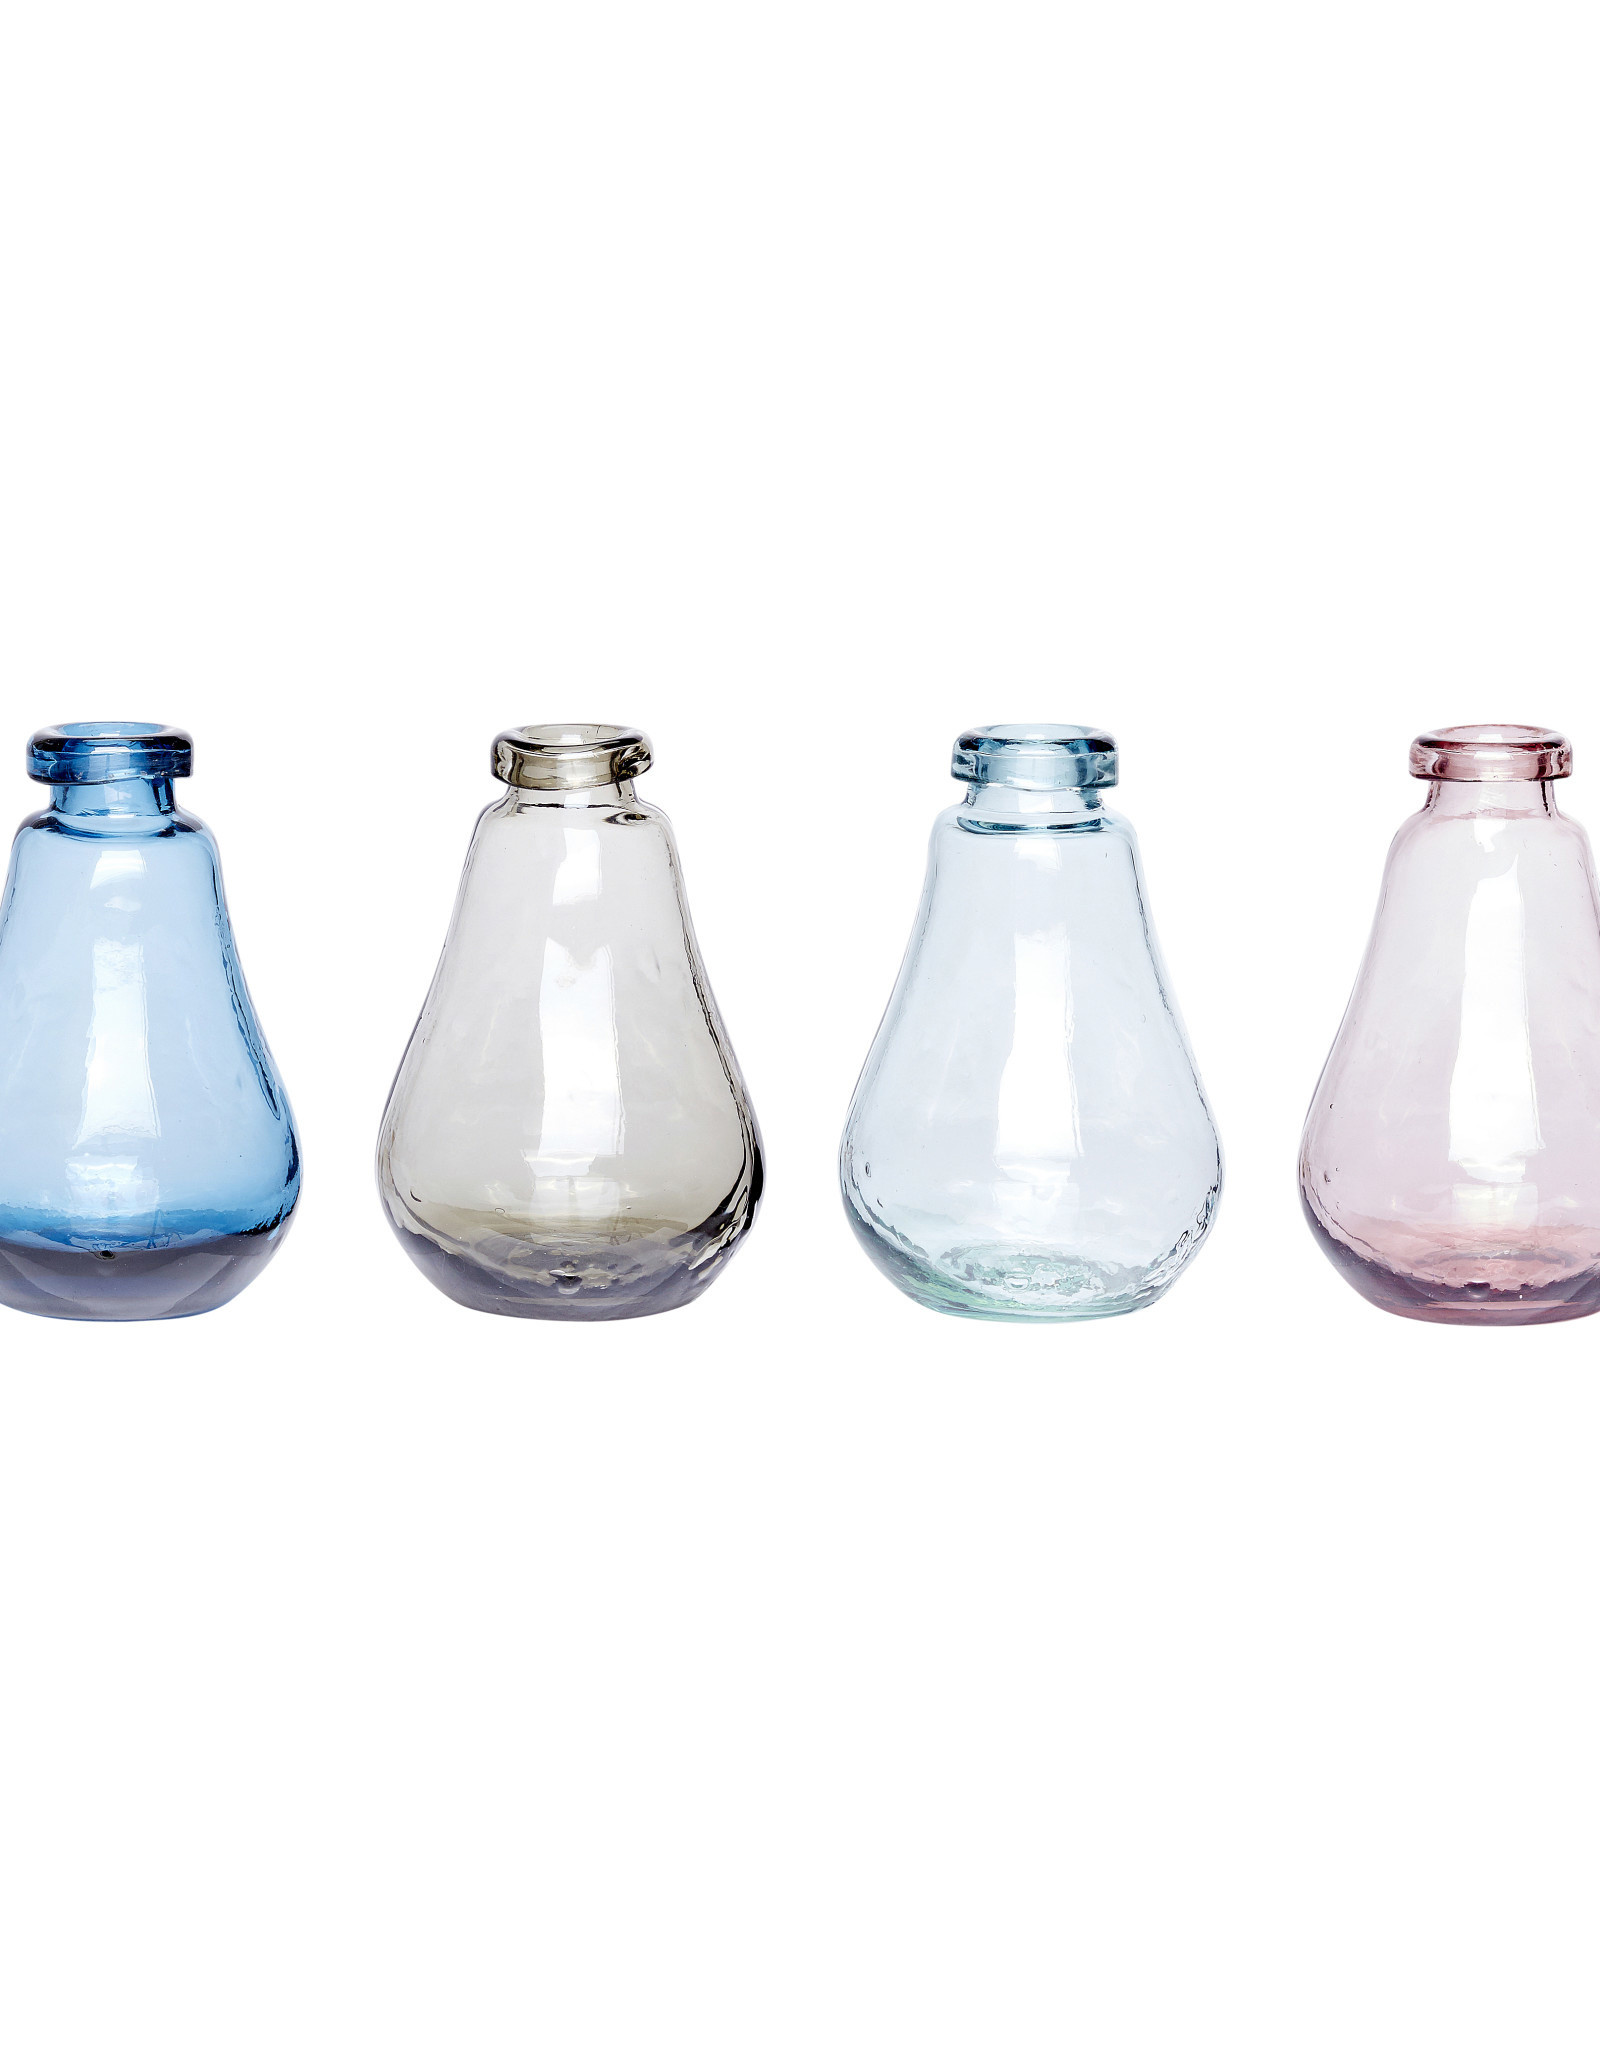 Hübsch Vase - Blue ø9xh13cm